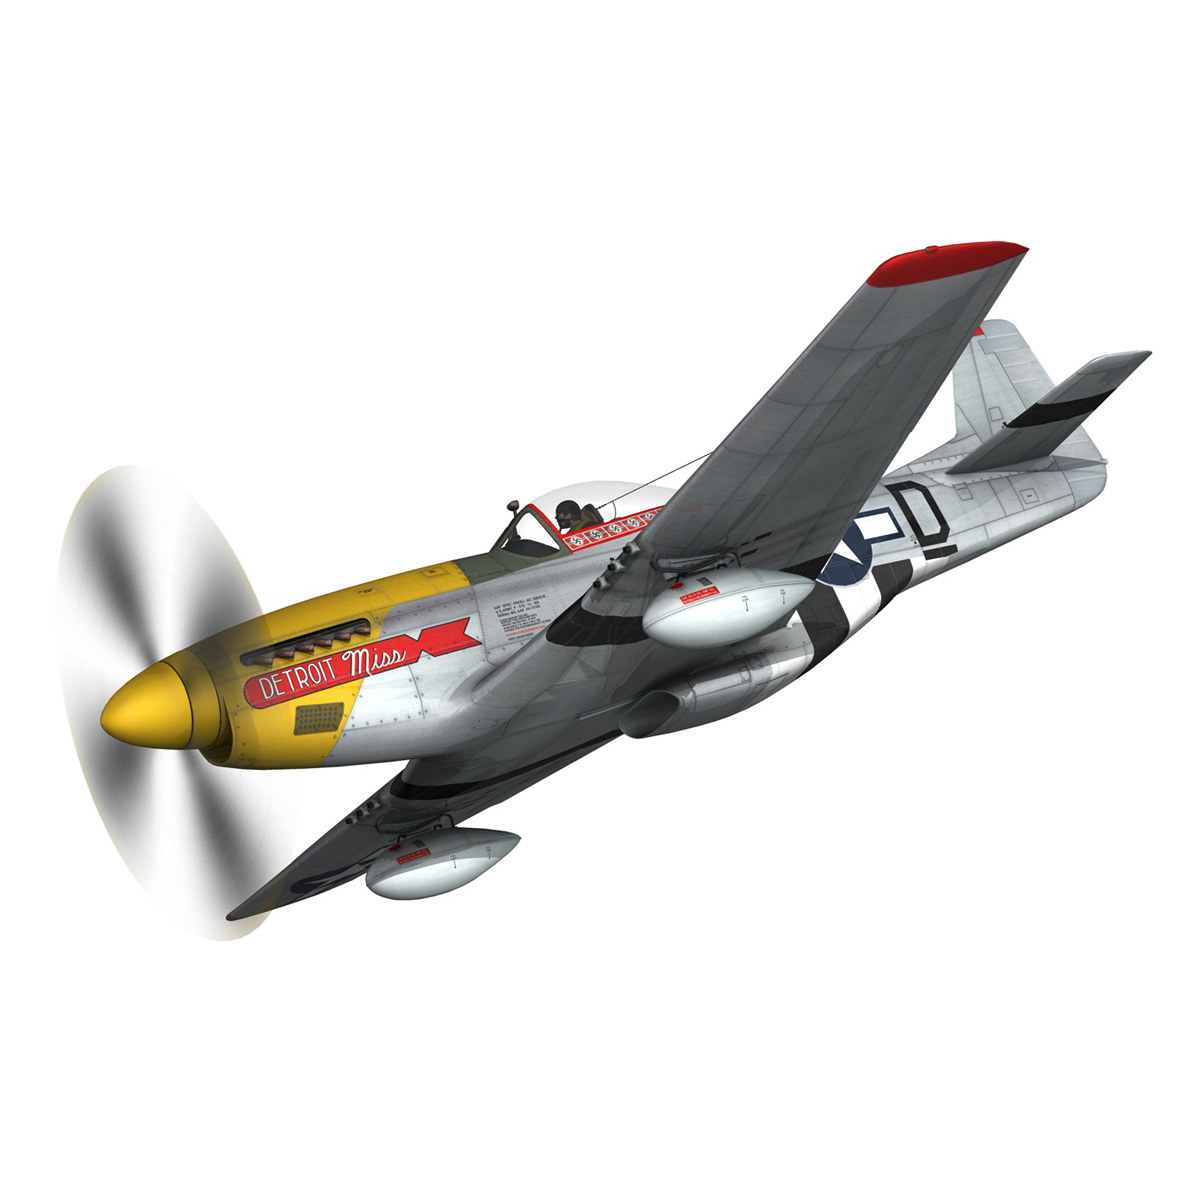 north american p-51d – mustang – detroit miss 3d model 3ds fbx c4d lwo obj 267595